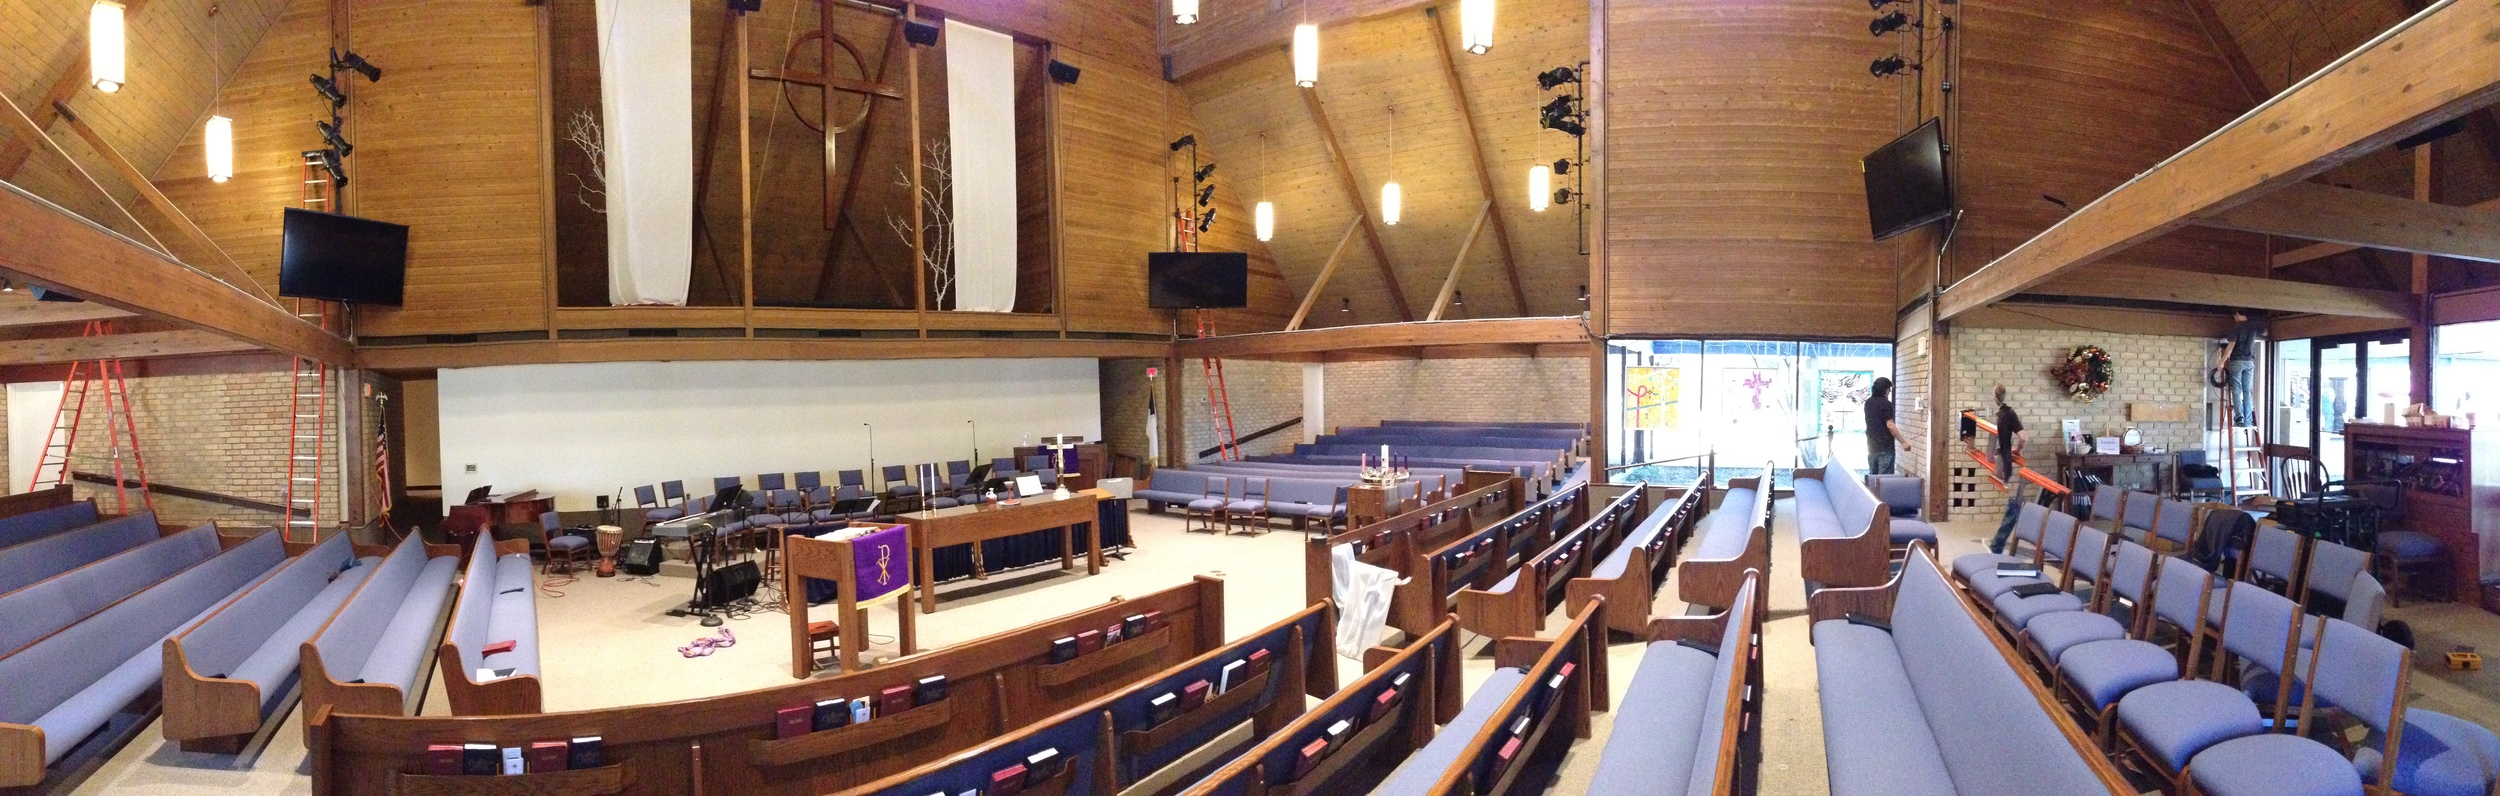 church installation.jpg